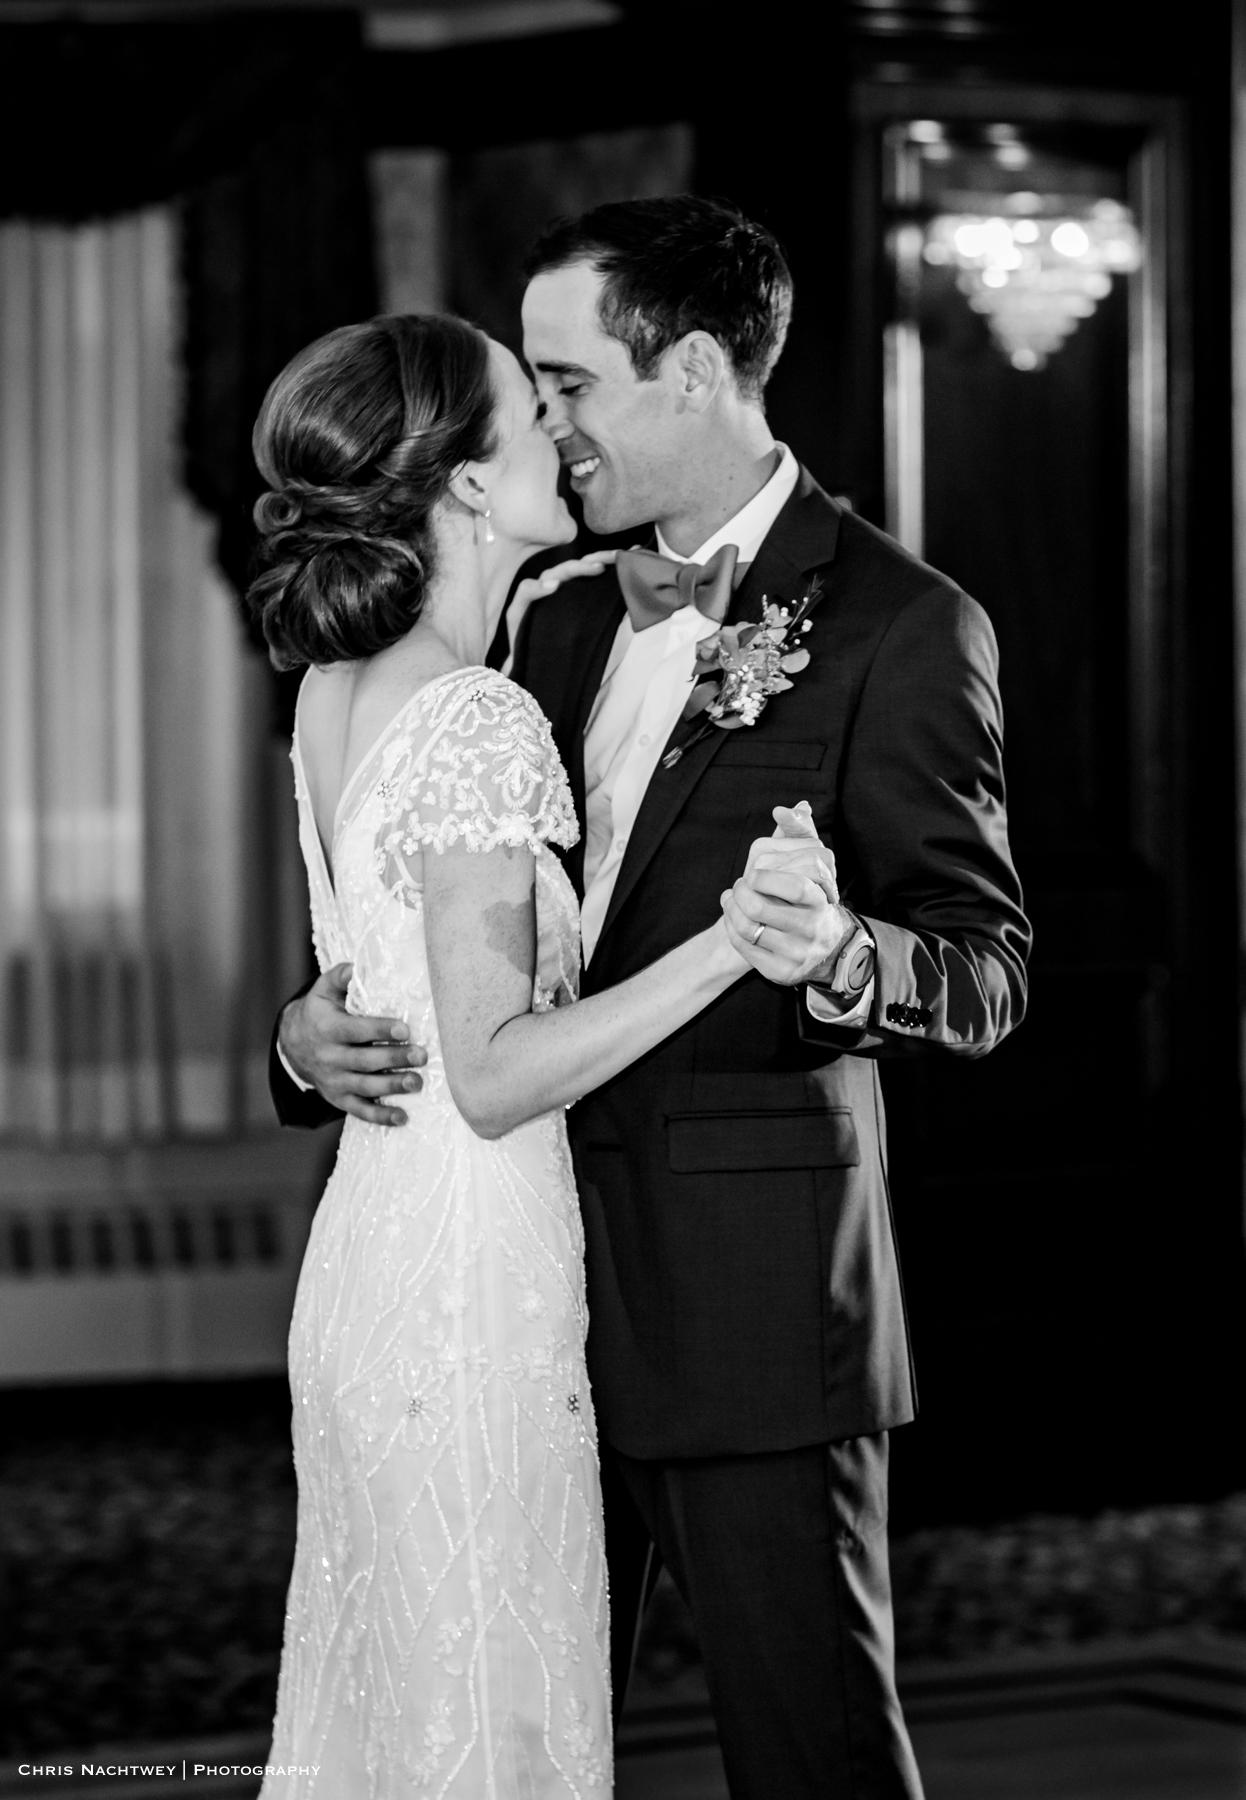 photos-wedding-quidnessett-country-club-ri-chris-nachtwey-photography-2018-49.jpg